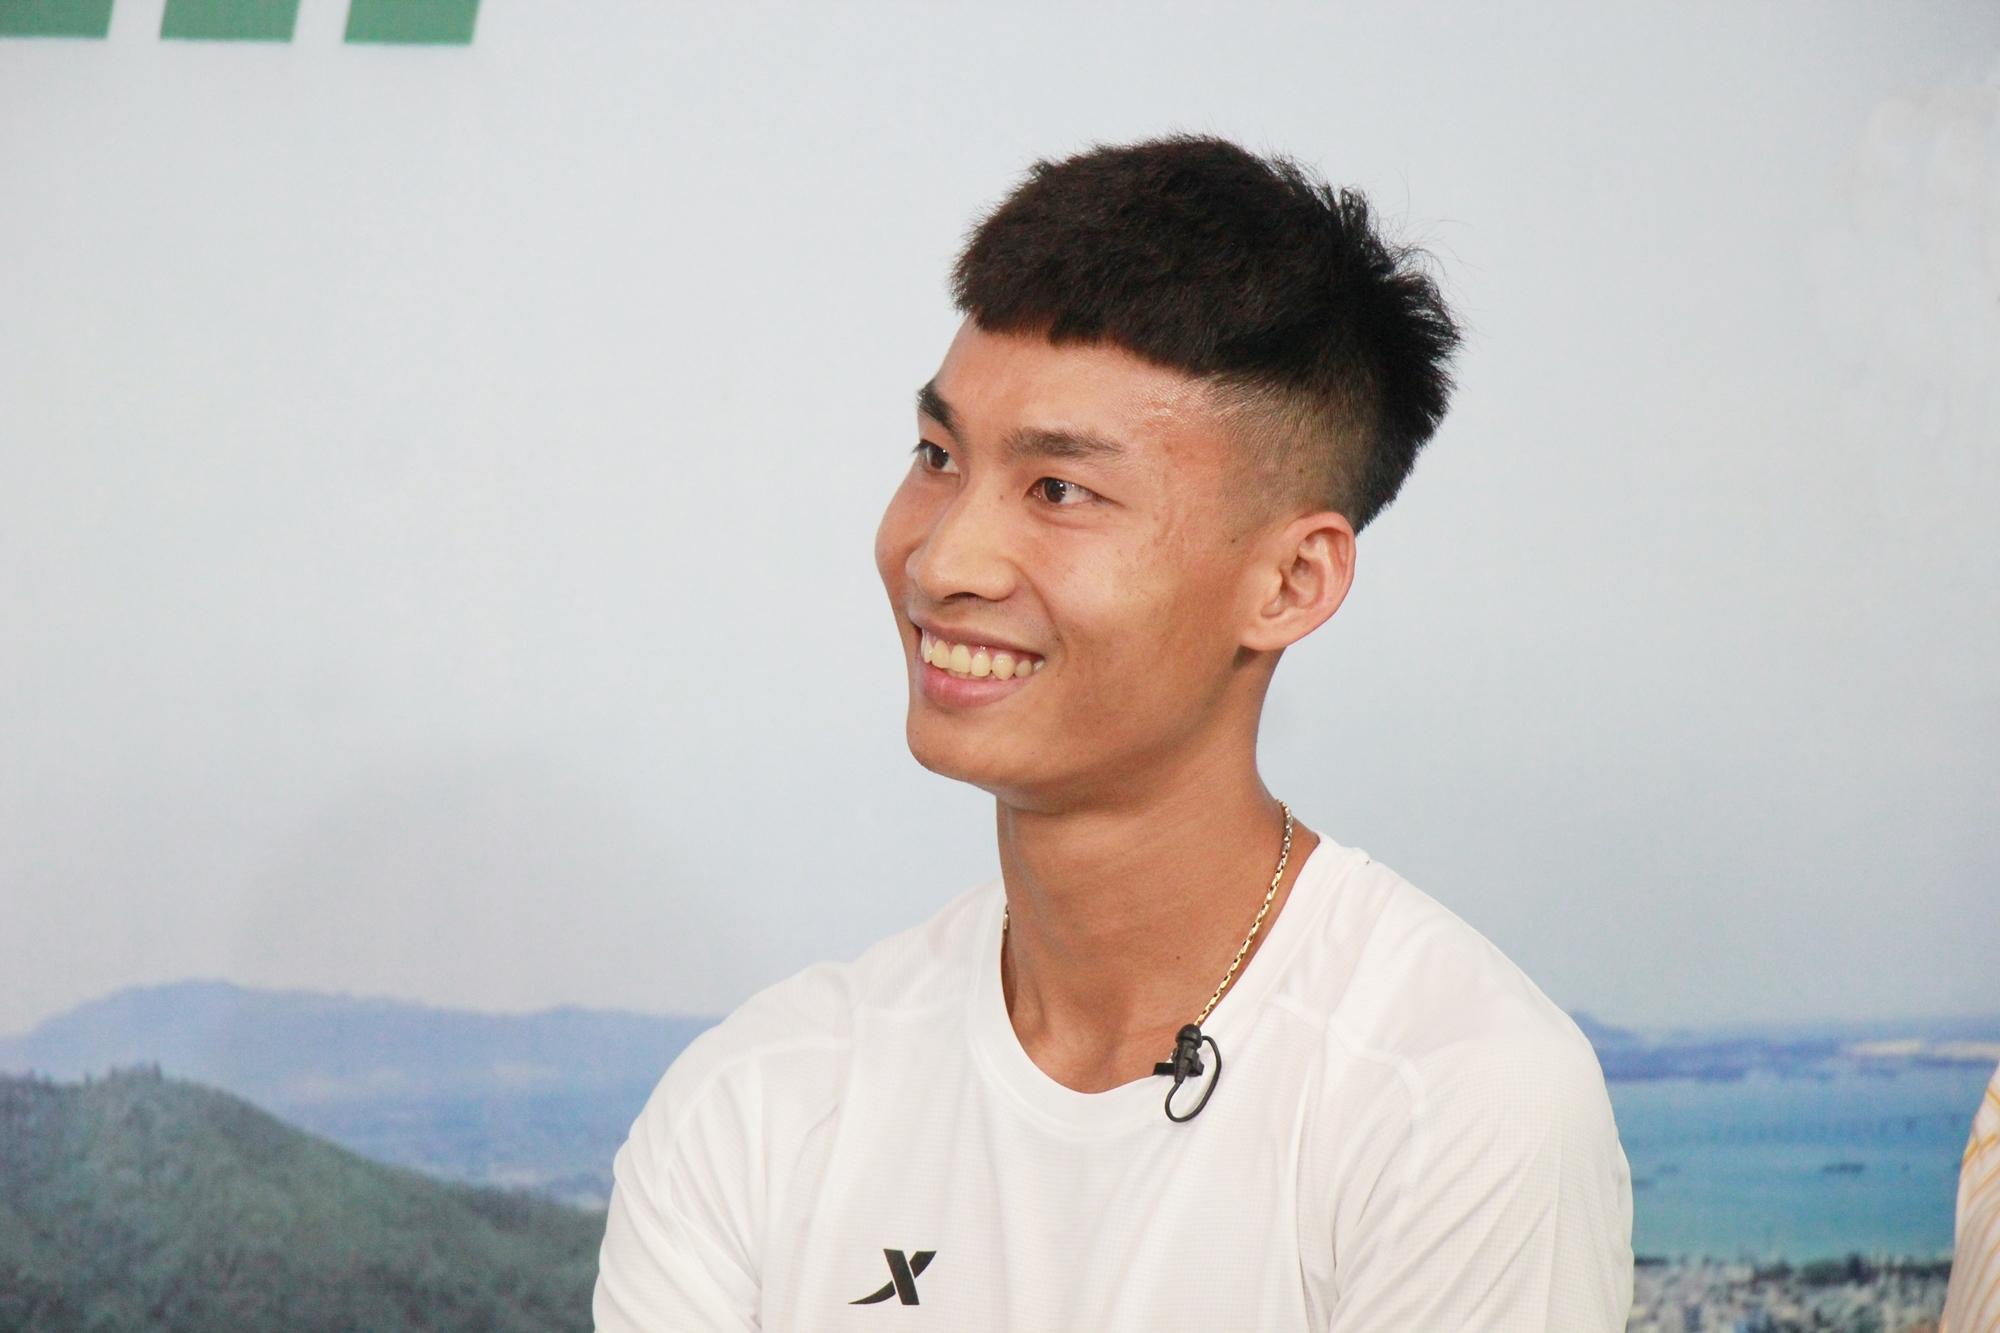 Trinh Quoc Luong - the defending champion at a distance of 42km VnExpress Marathon Hanoi Midnight 2020. Photo: Pham An.